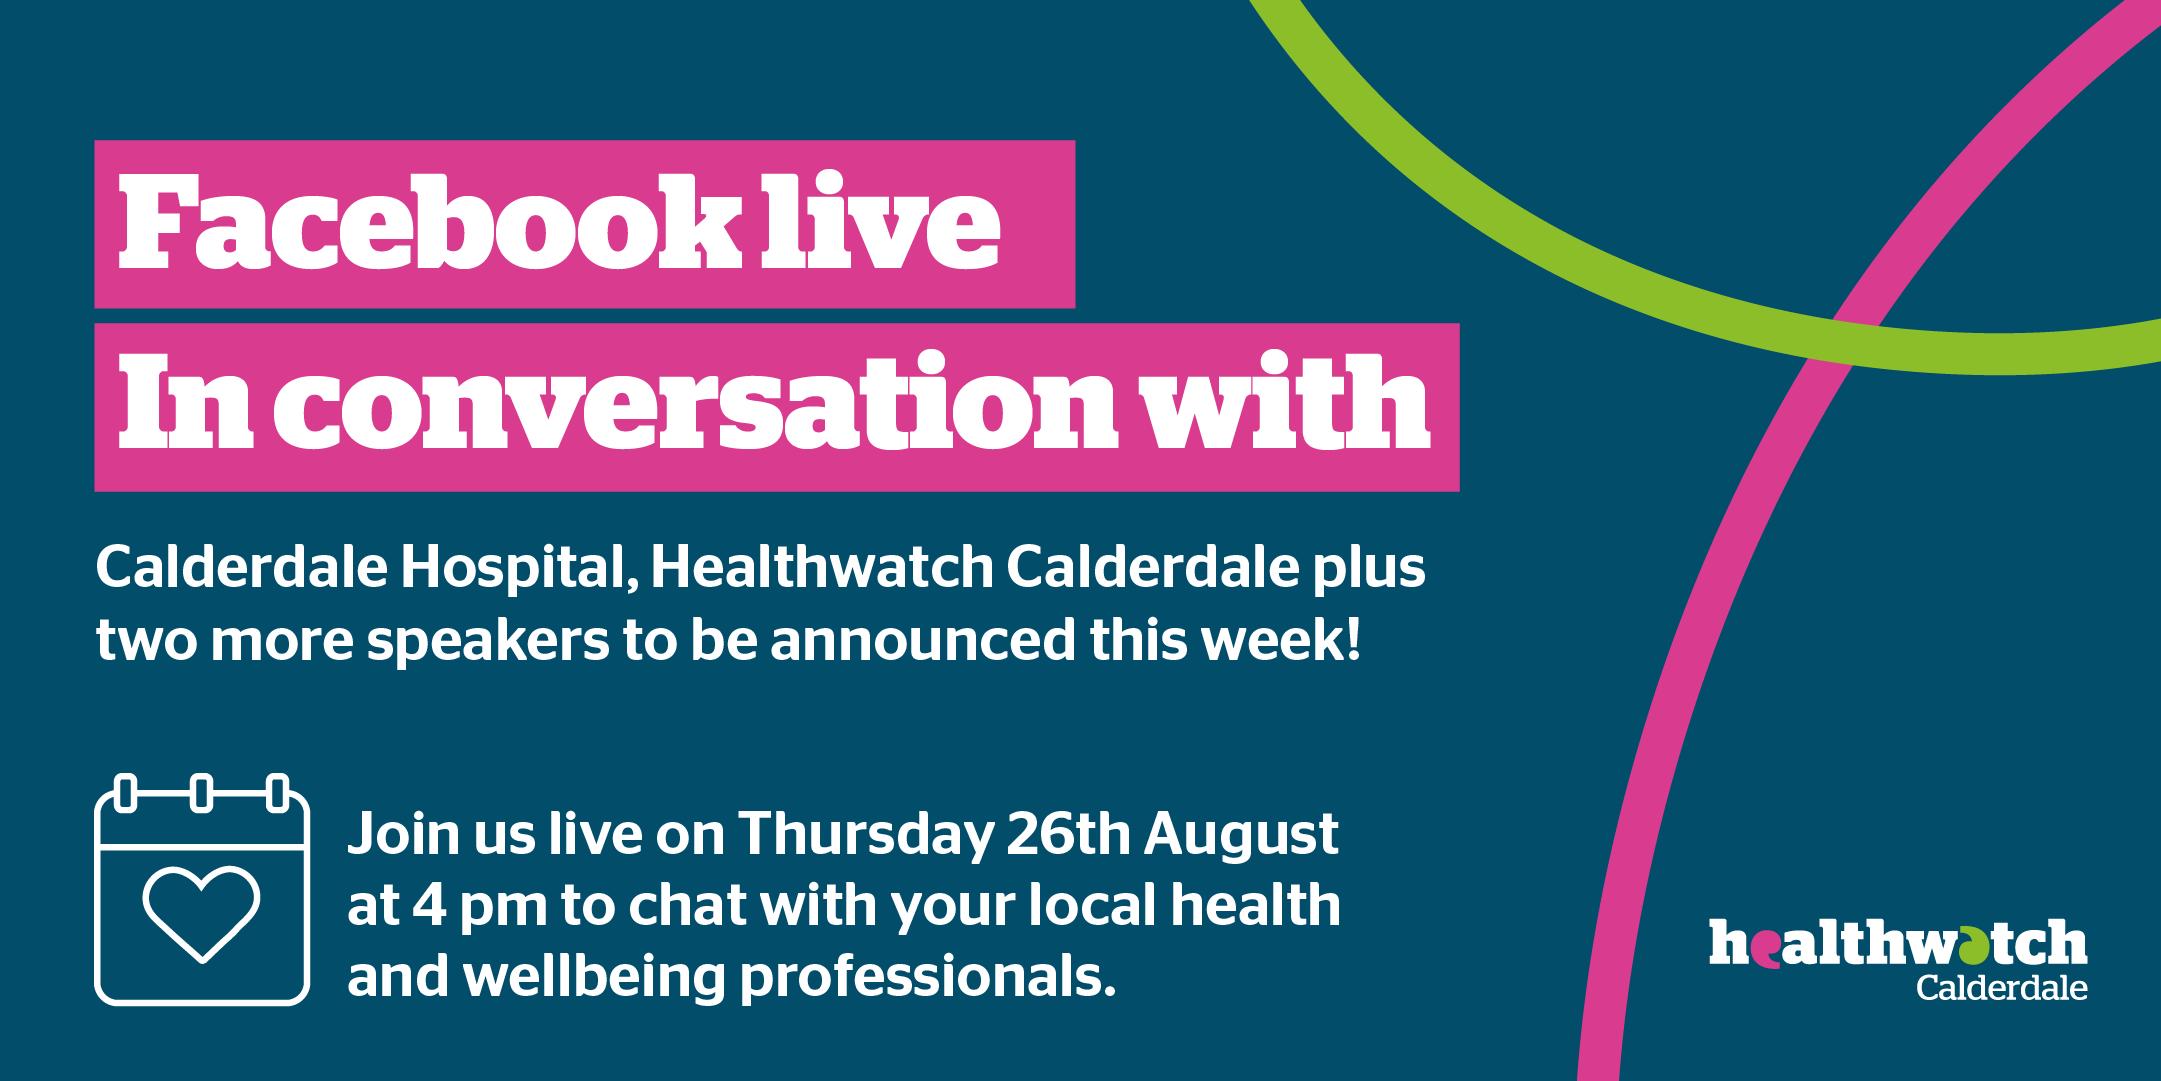 Facebook live event poster